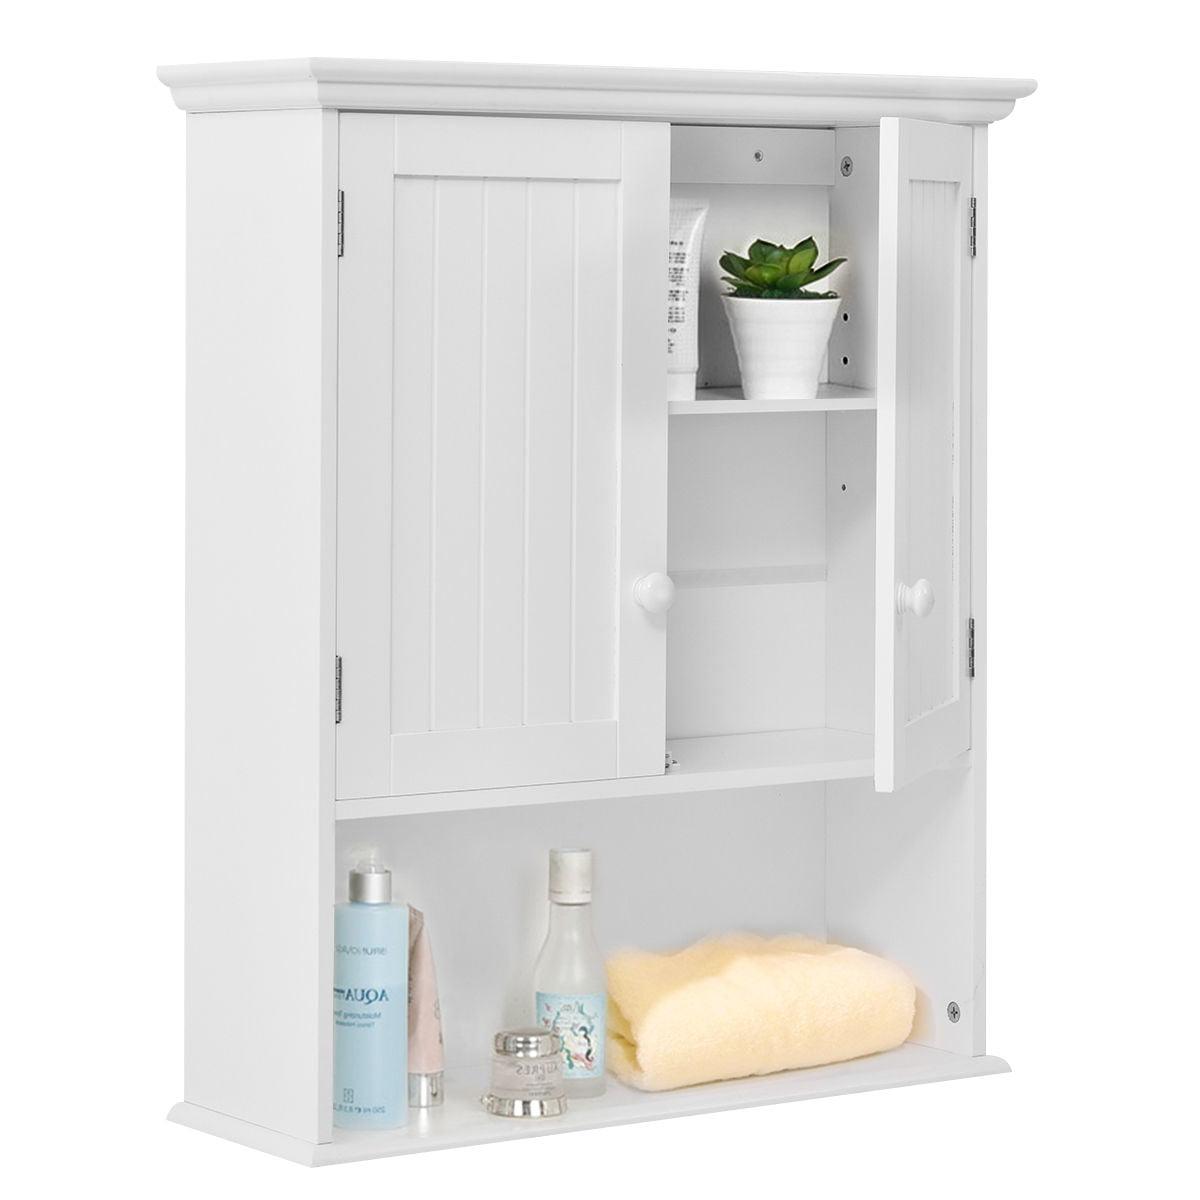 Costway Wall Mount Bathroom Cabinet Storage Organizer Medicine Cabinet Kitchen Laundry by Costway